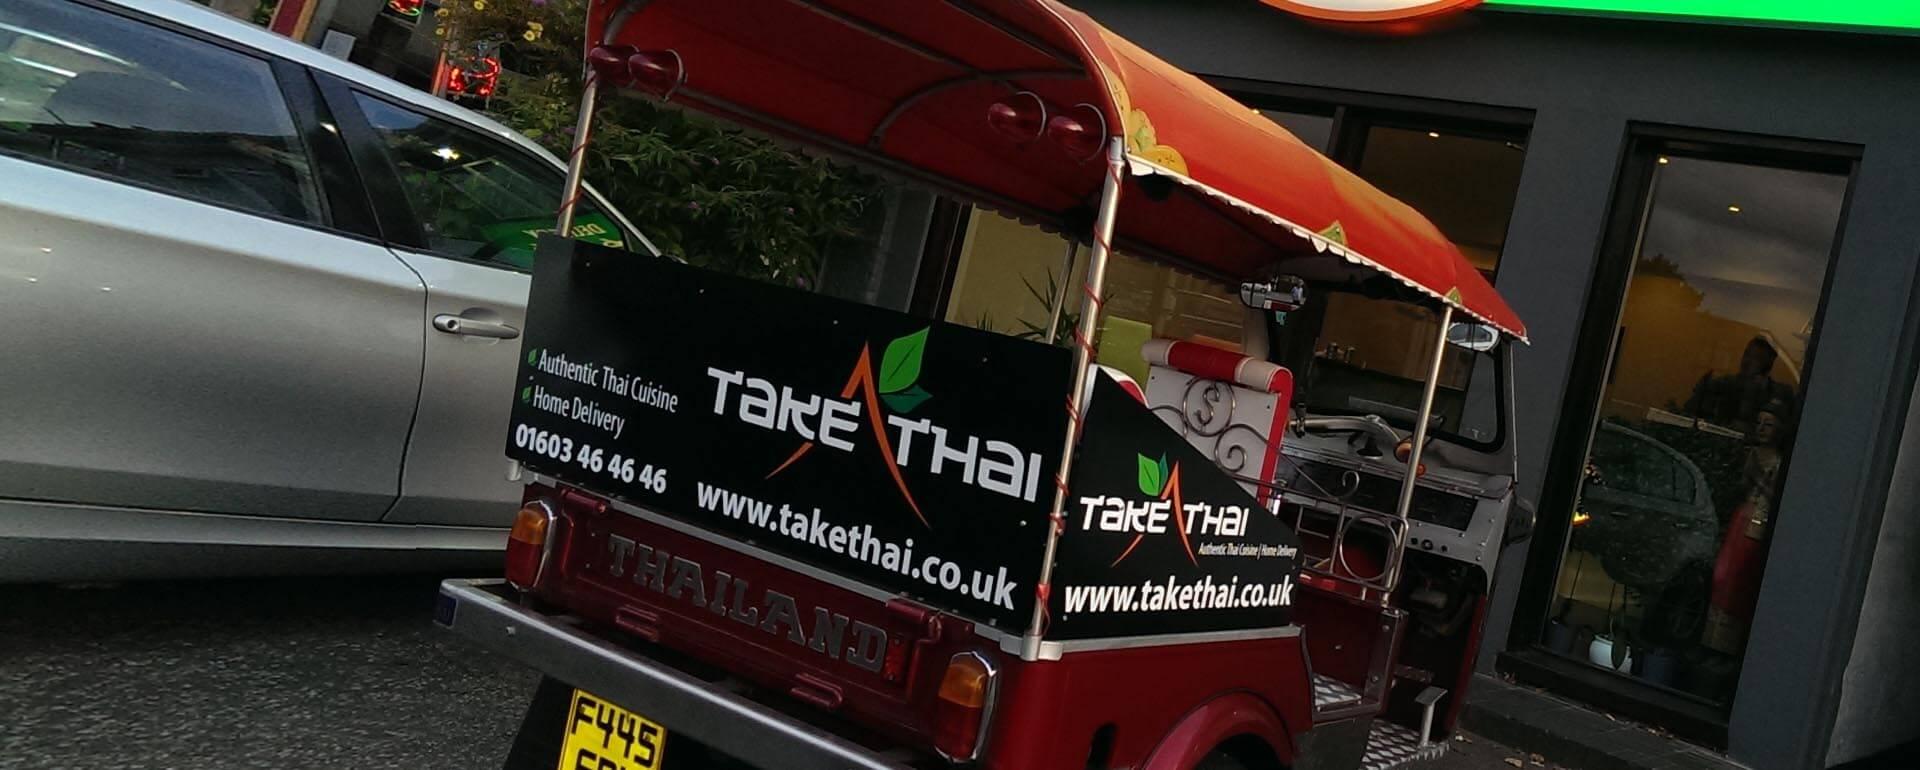 Take Thai Tut Tut Vinyl graphics Panels